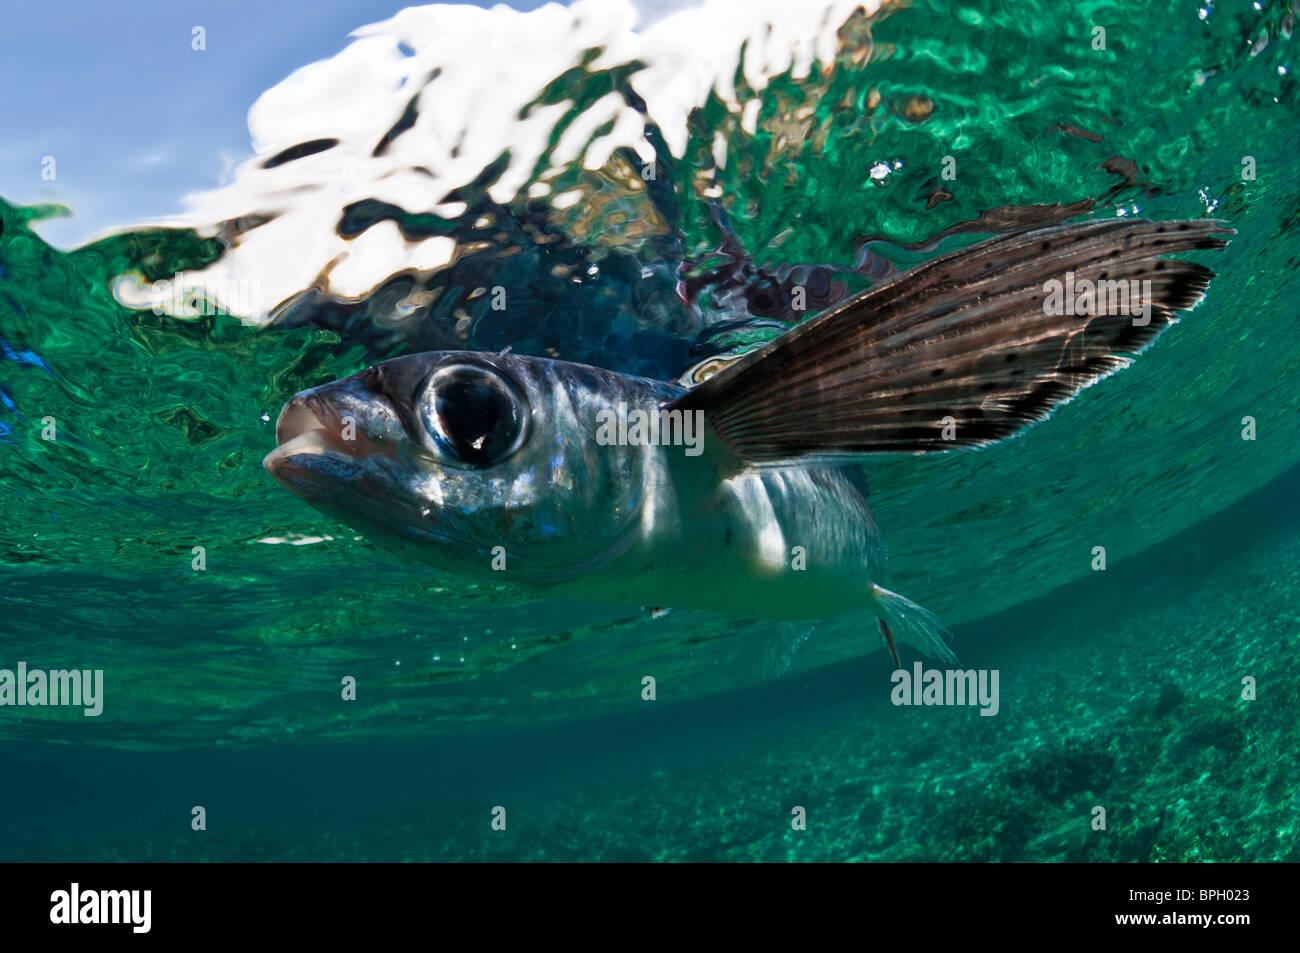 Flying fish, Menjangan Island, Bali, Indonesia. - Stock Image